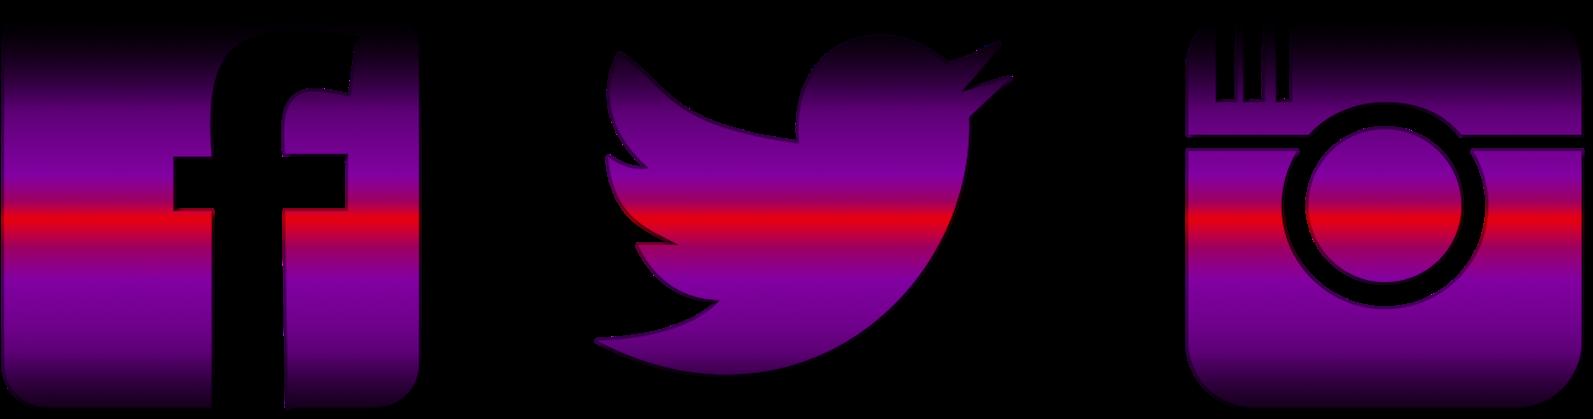 Clip Art Free Instagram Twitter Facebook Icons - Facebook Instagram Twitter Png (1600x454), Png Download